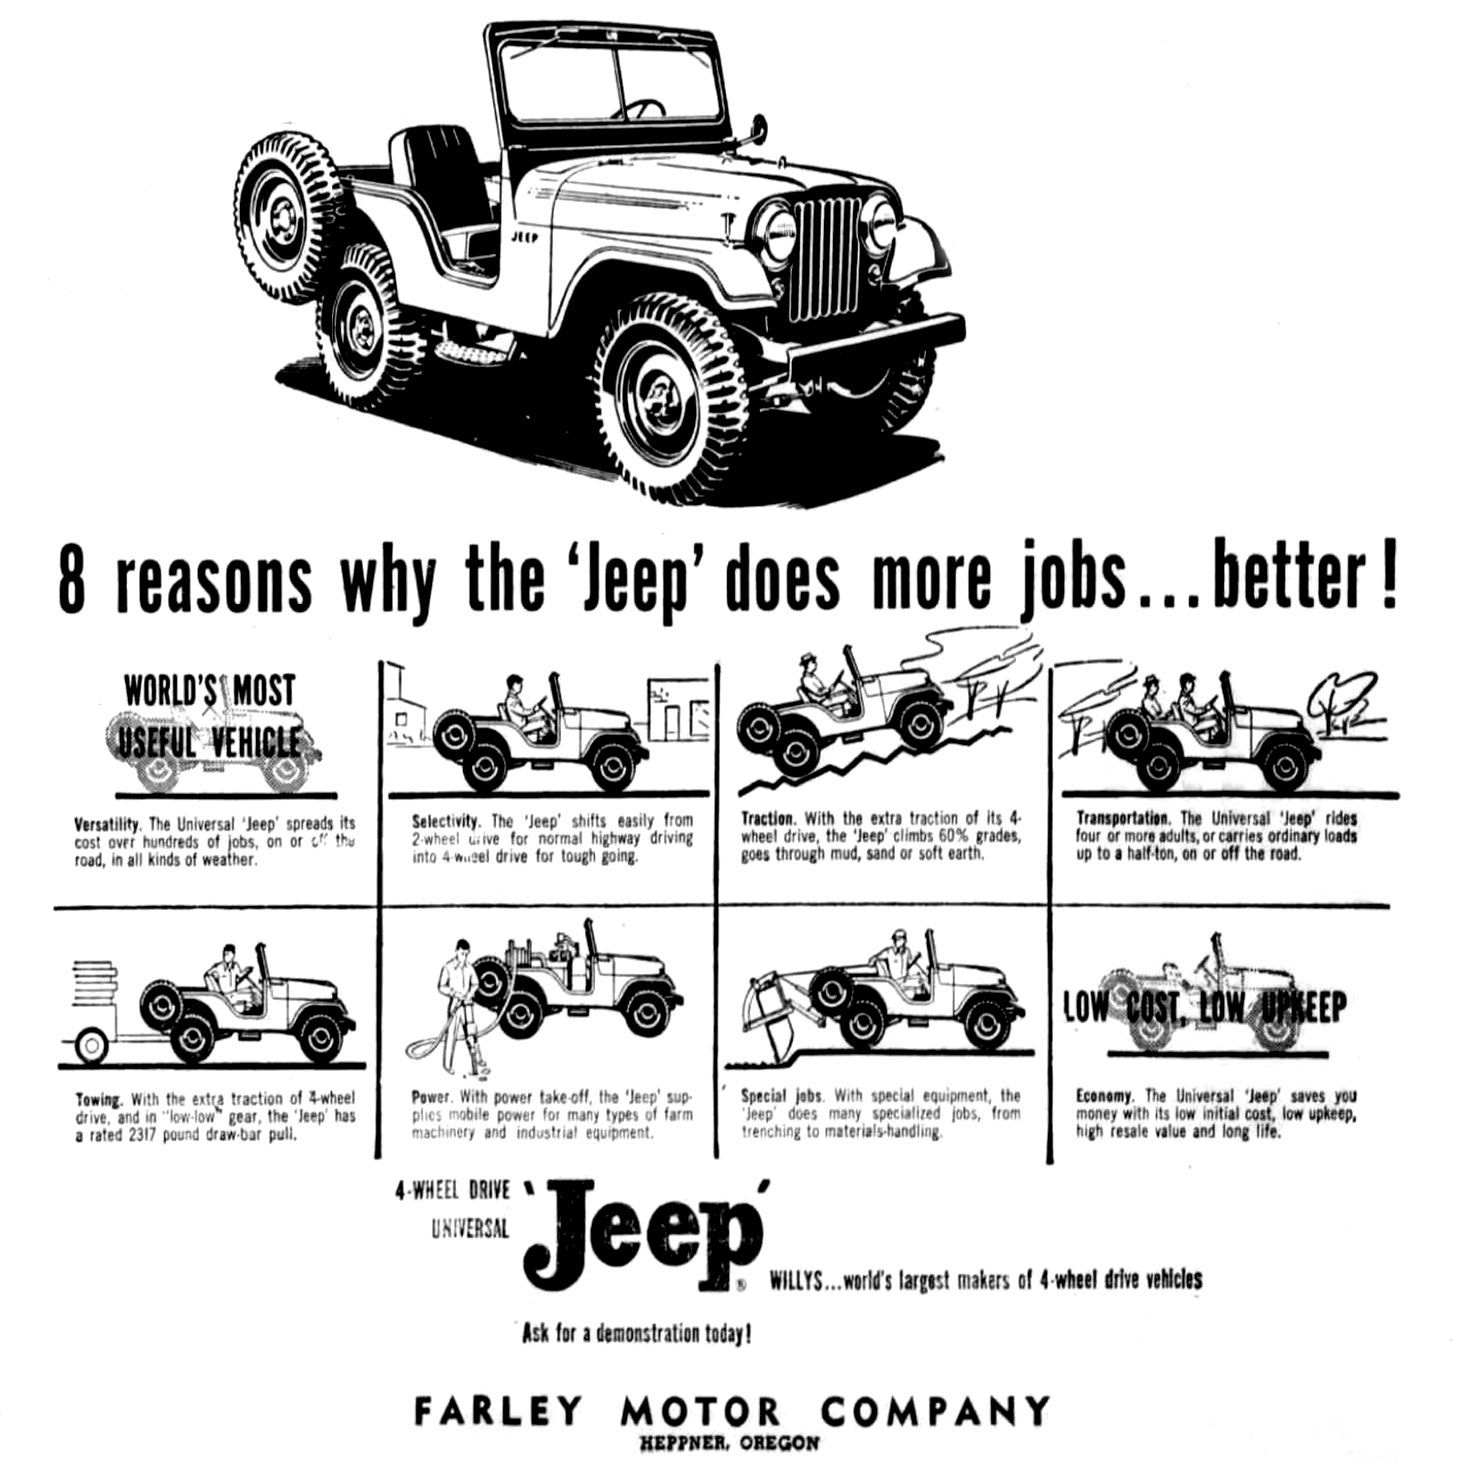 03 15 Heppner Gazette Times Cj5 Universal Jeep Ad